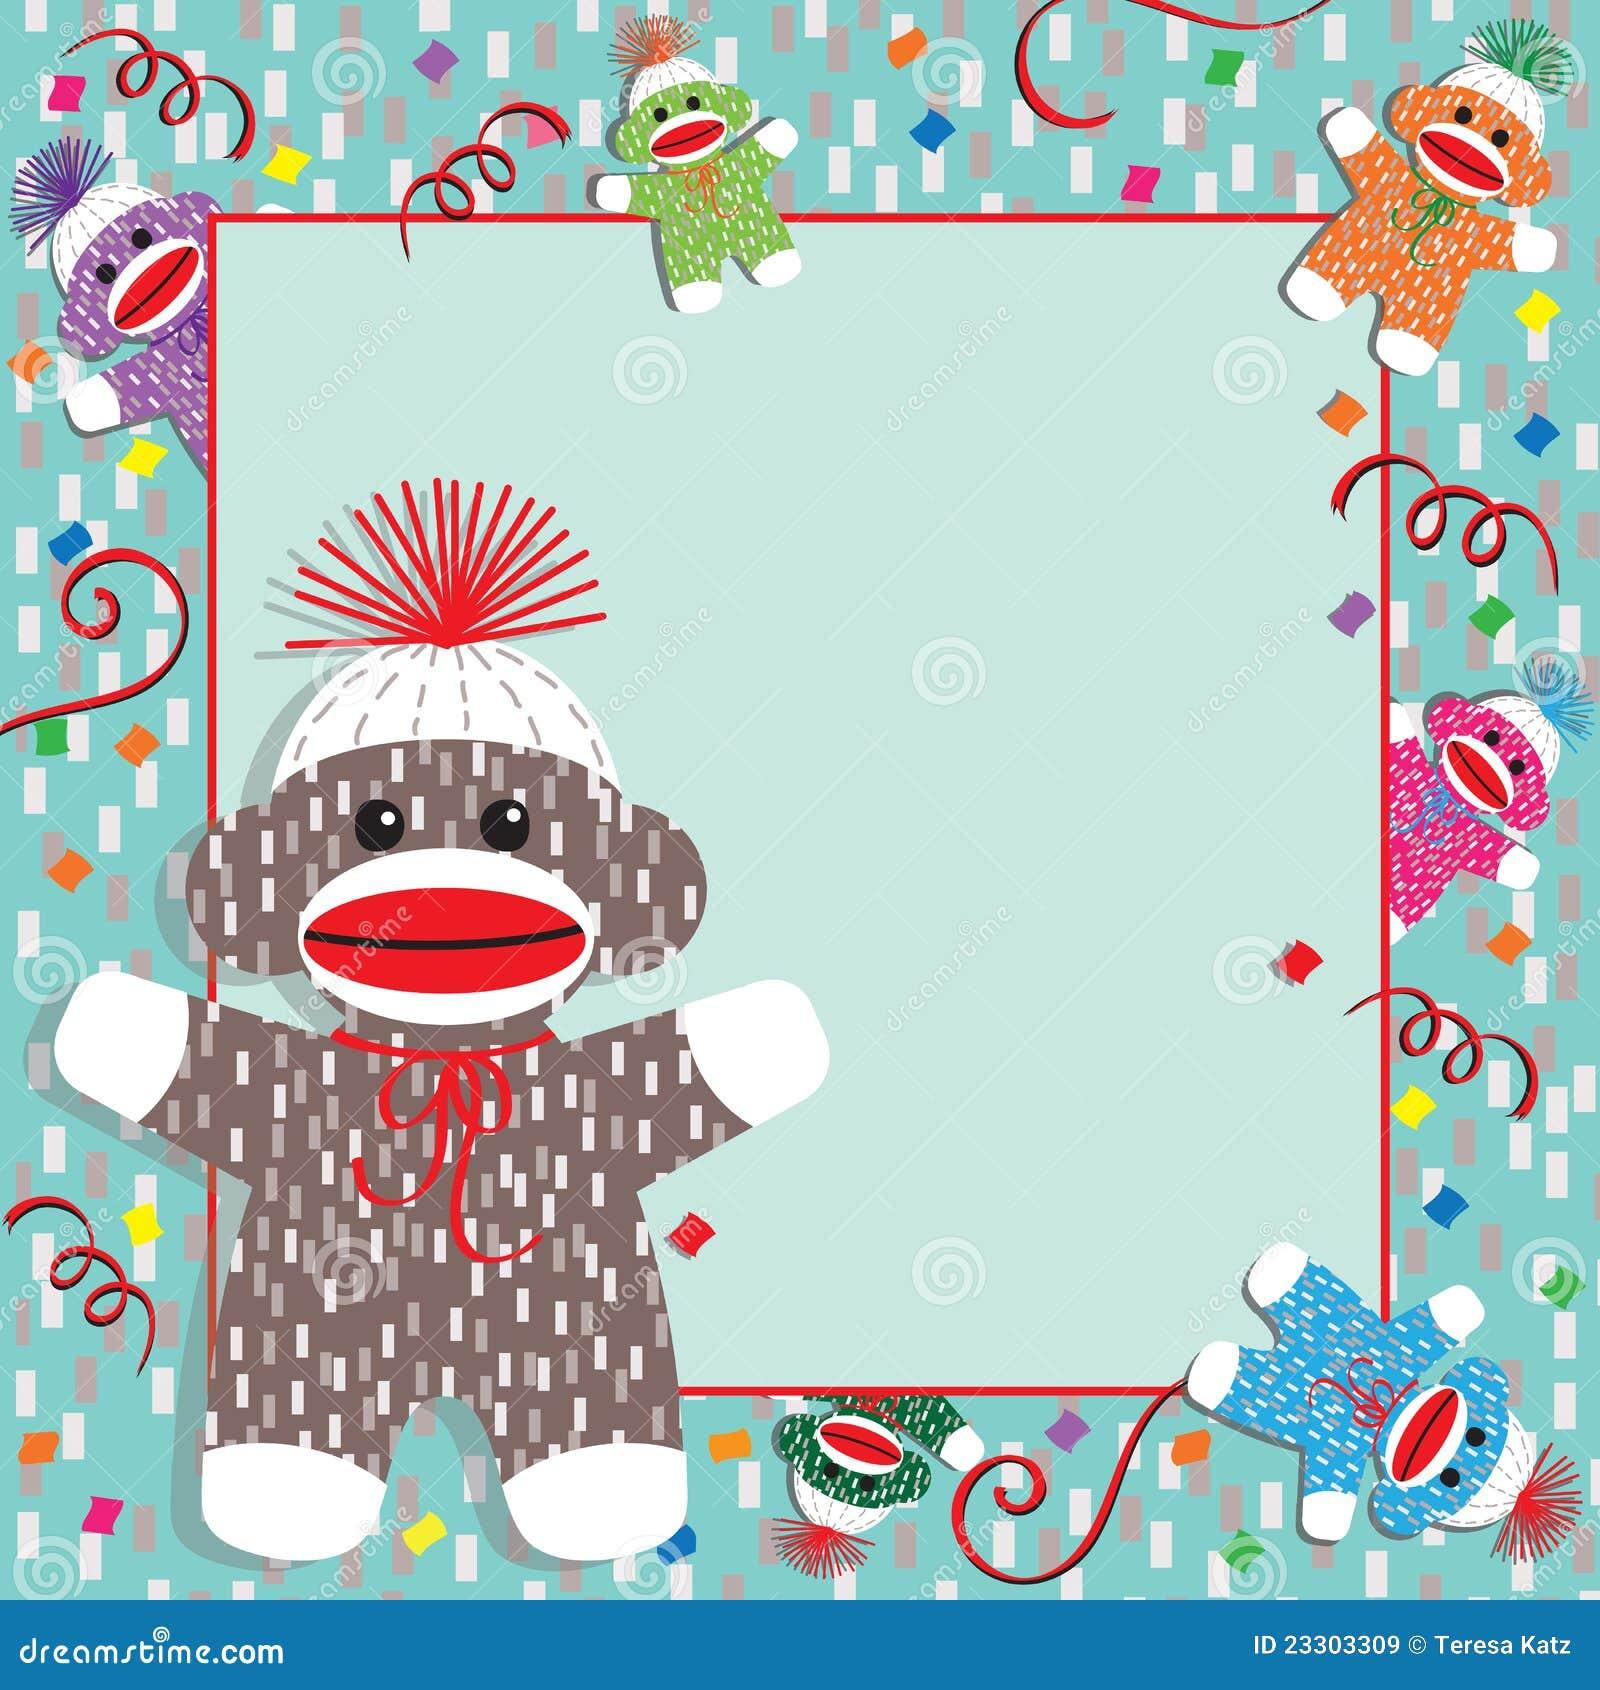 Sock Monkey Baby Shower Invitations for adorable invitation sample